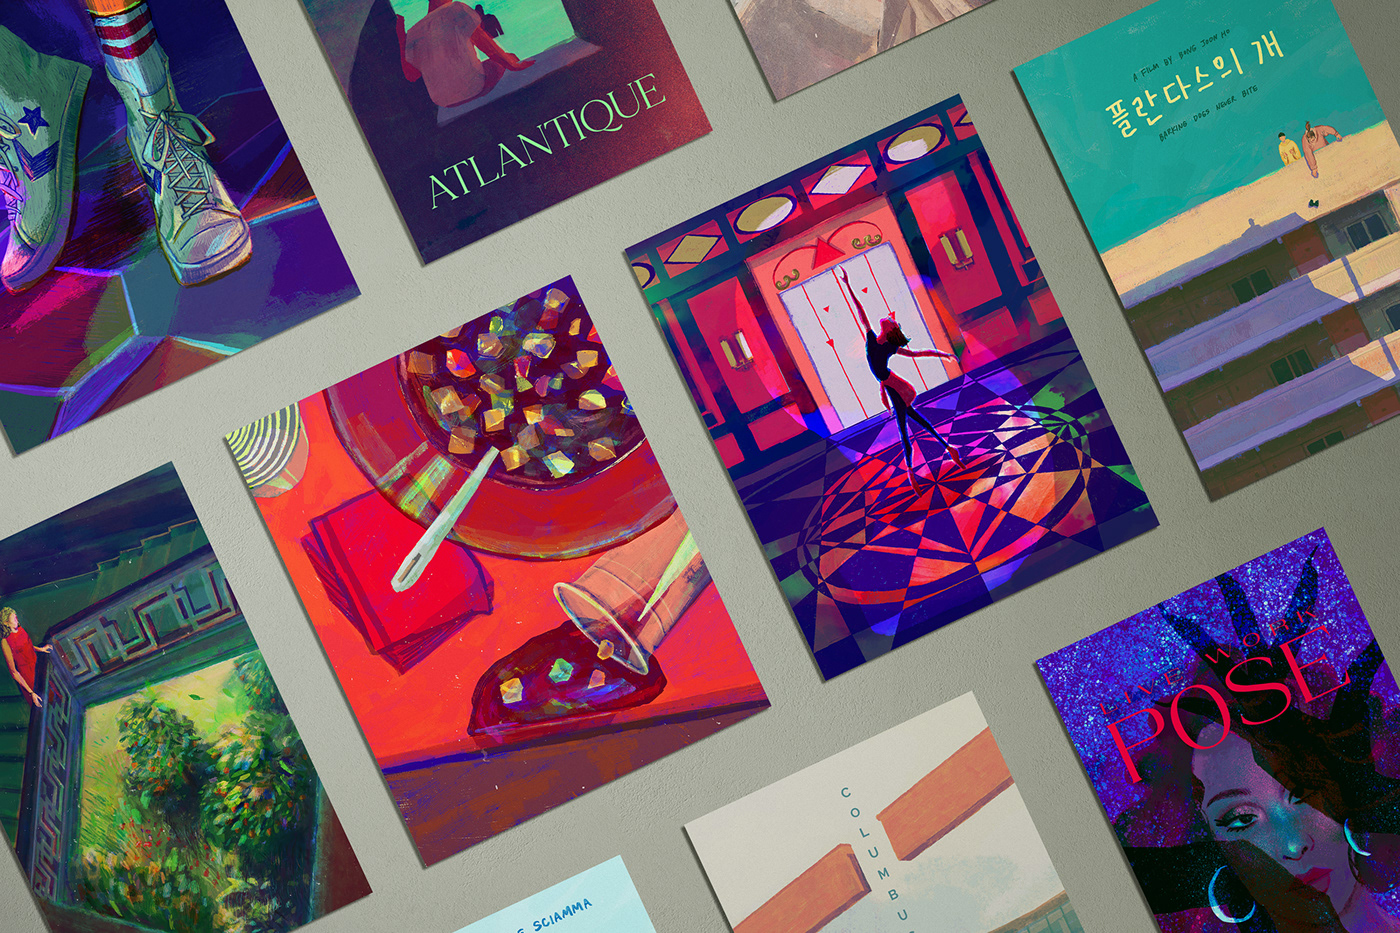 animation  film poster ILLUSTRATION  movie poster posters Procreate animated illustration gif